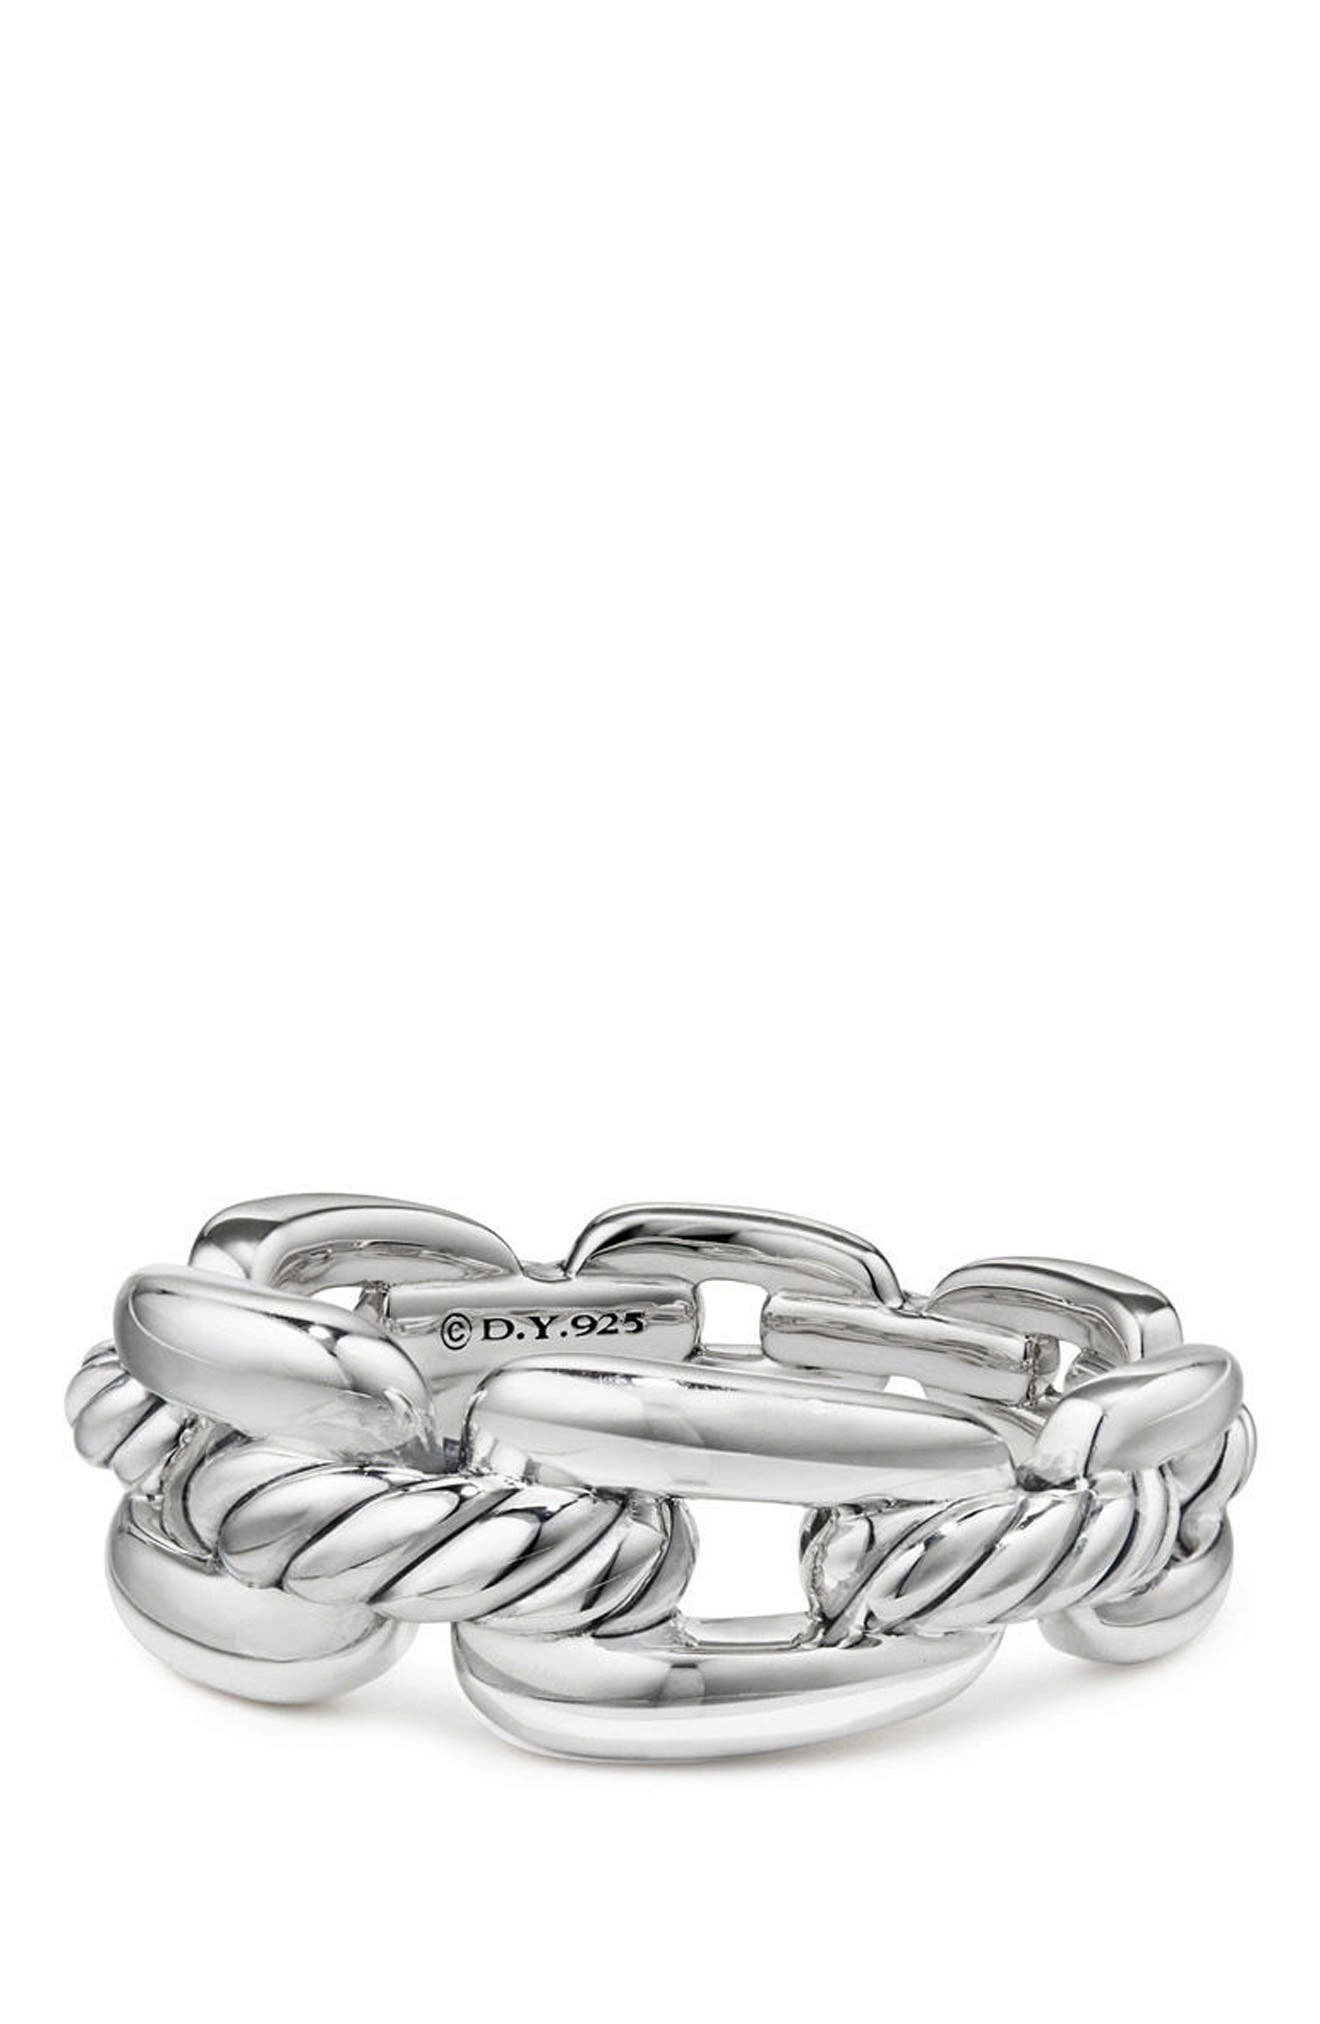 DAVID YURMAN, Wellesley Chain Link Ring with Diamonds, Main thumbnail 1, color, SILVER